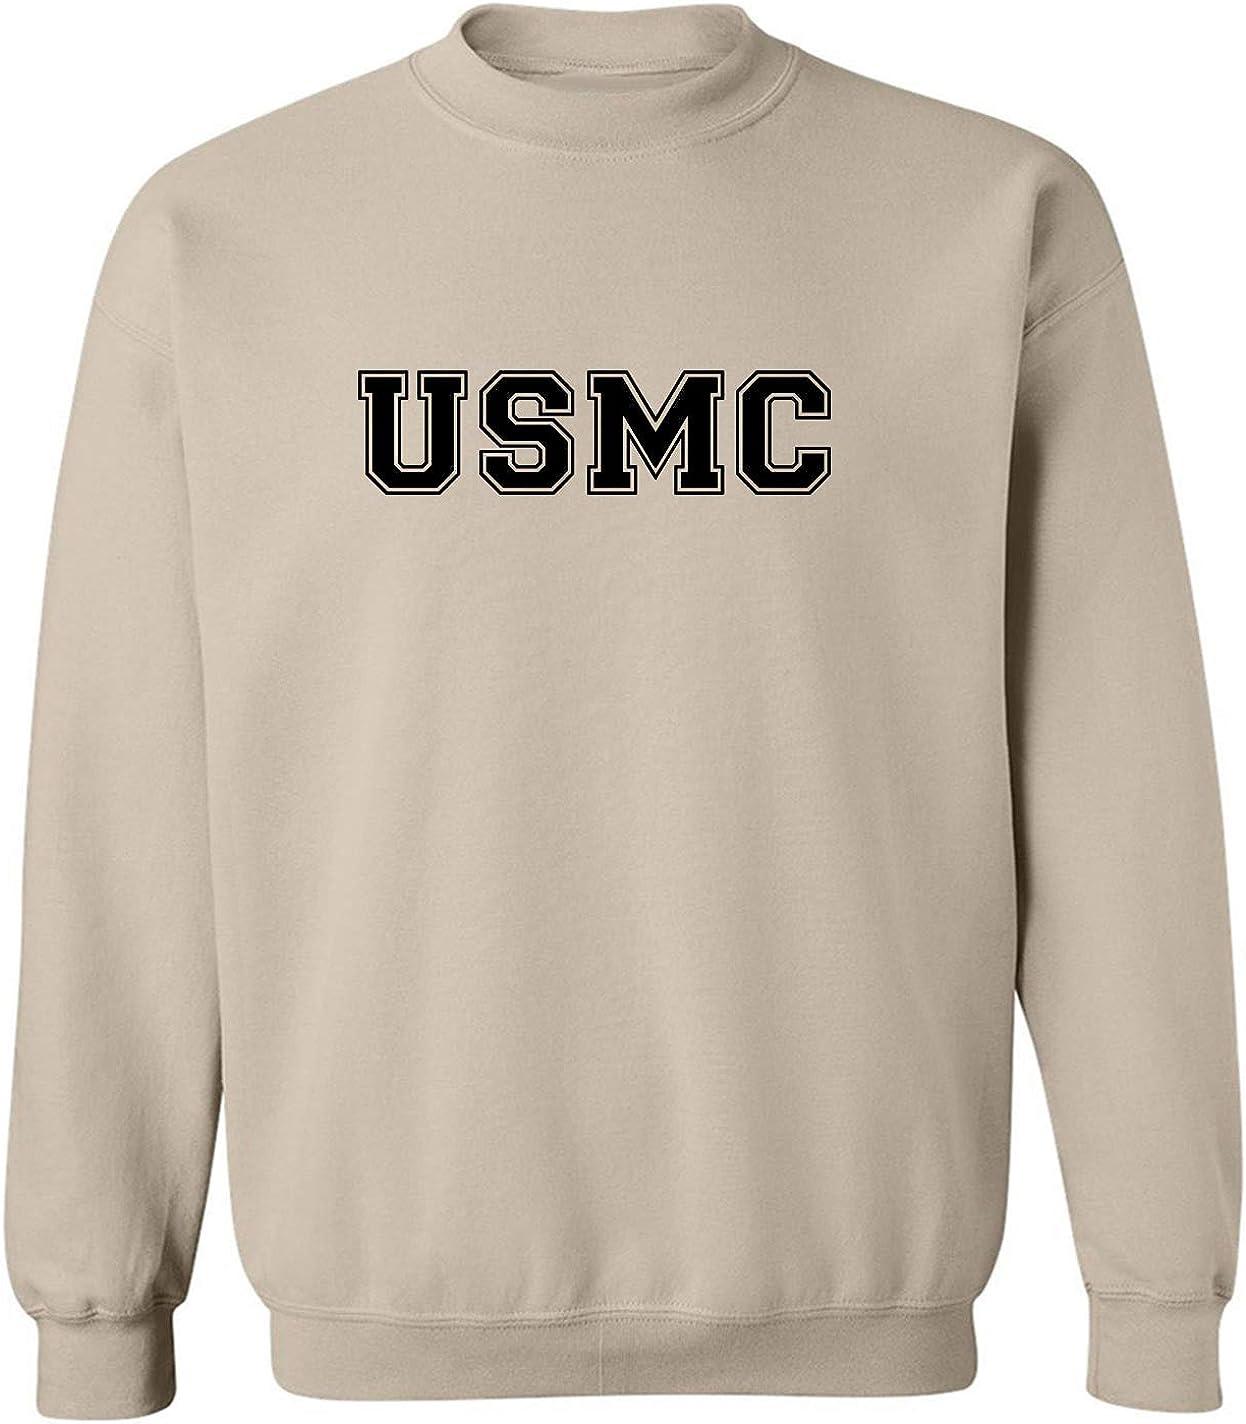 USMC Athletic Marines Crewneck OFFicial store in Sweatshirt Sand Bargain